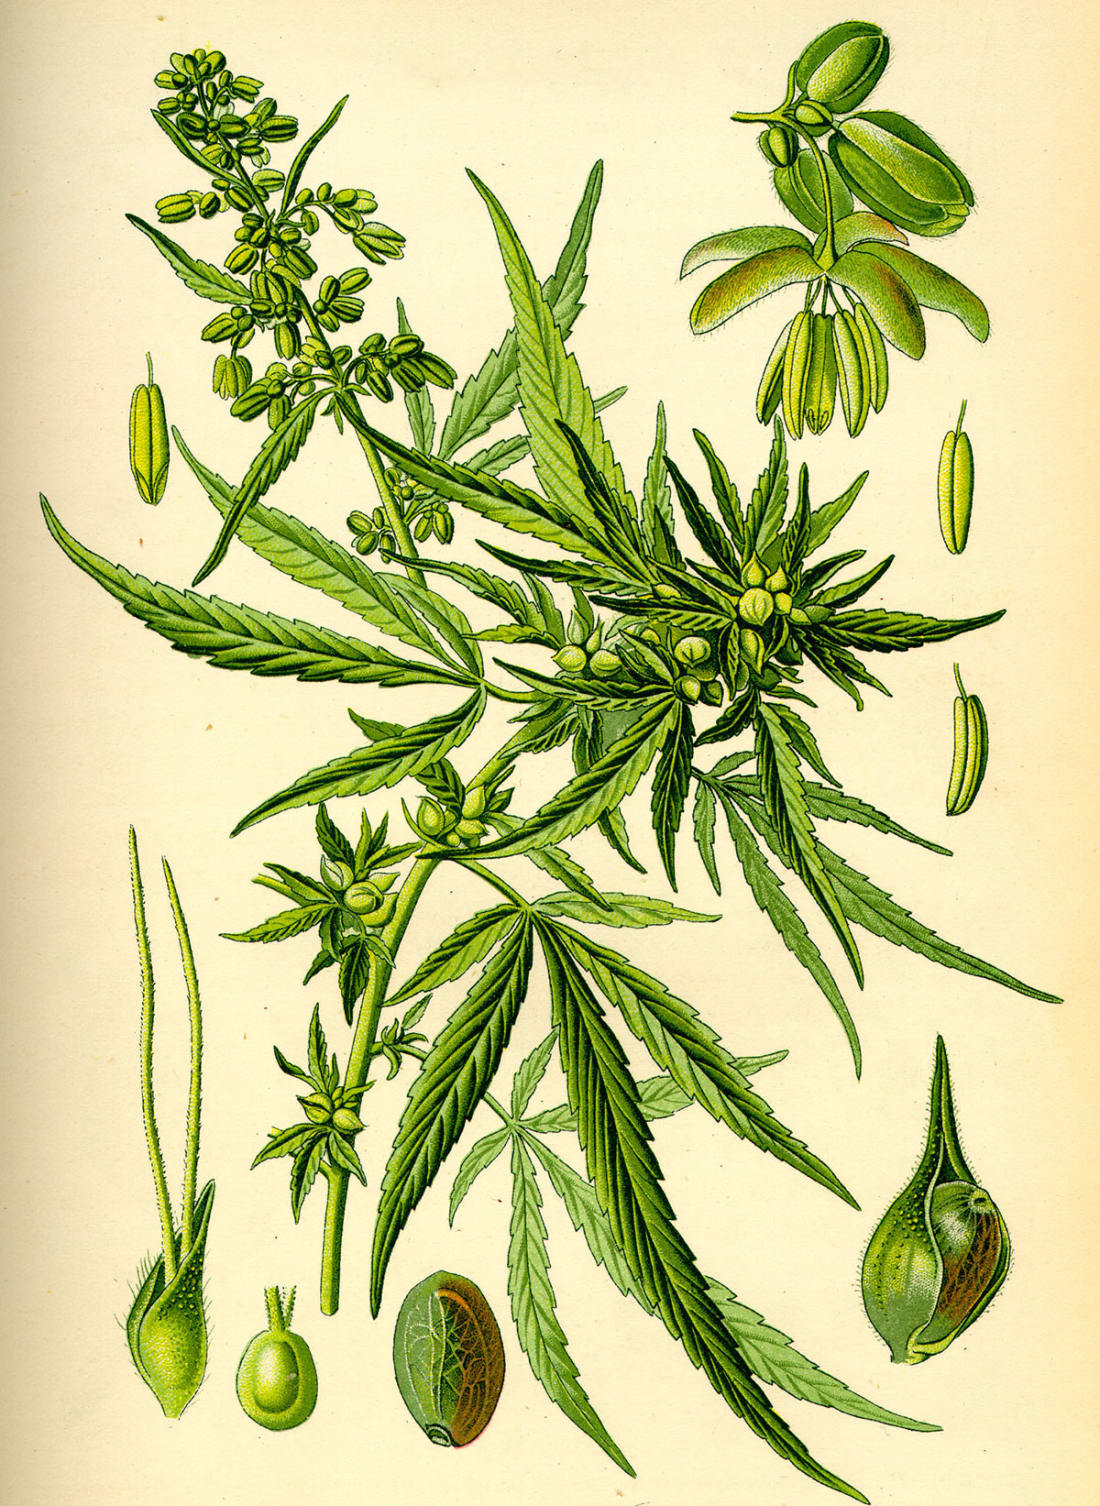 How to grow potent marijuana potent image via daily public nvjuhfo Image collections